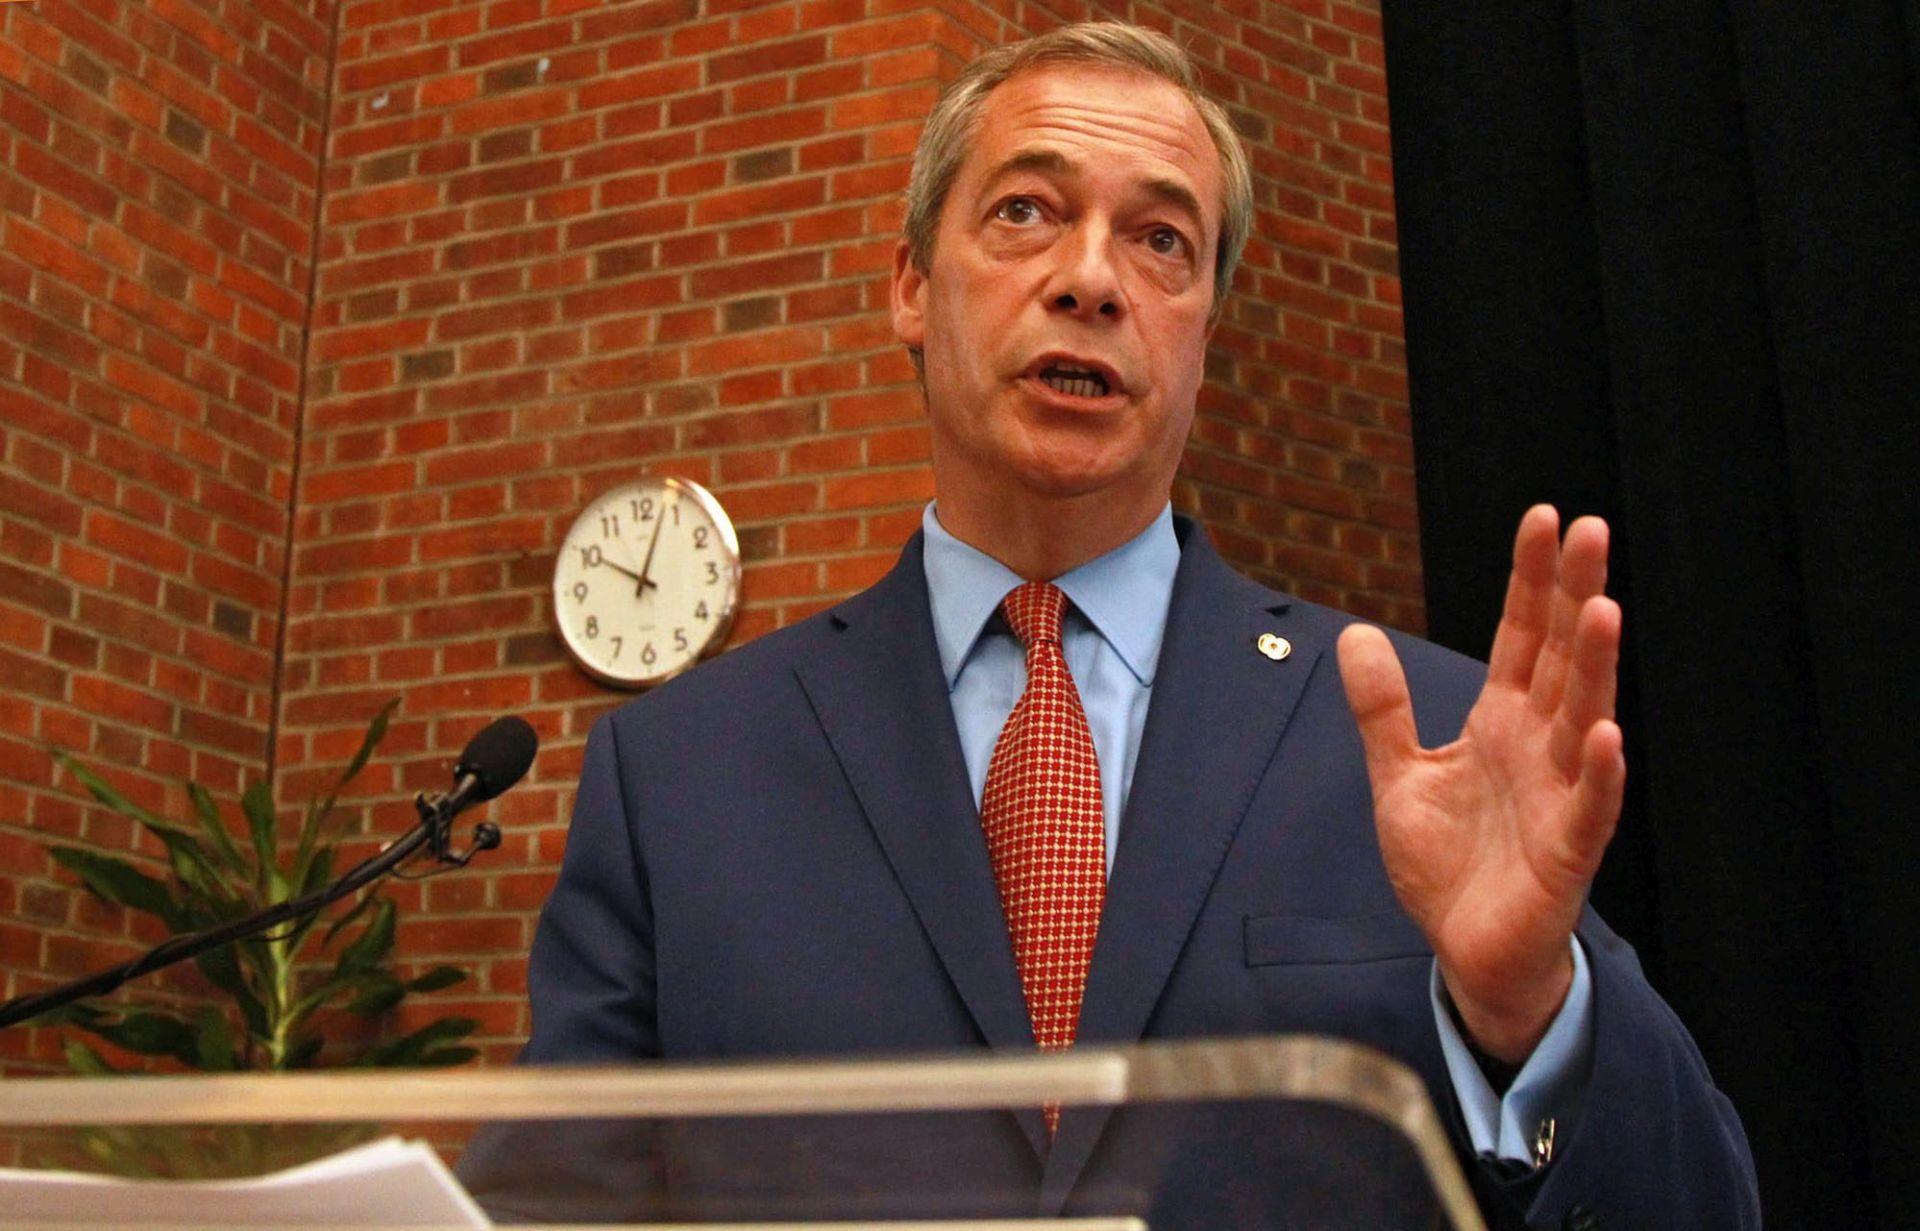 Skup u Mississippiju: Farage podržao Trumpa